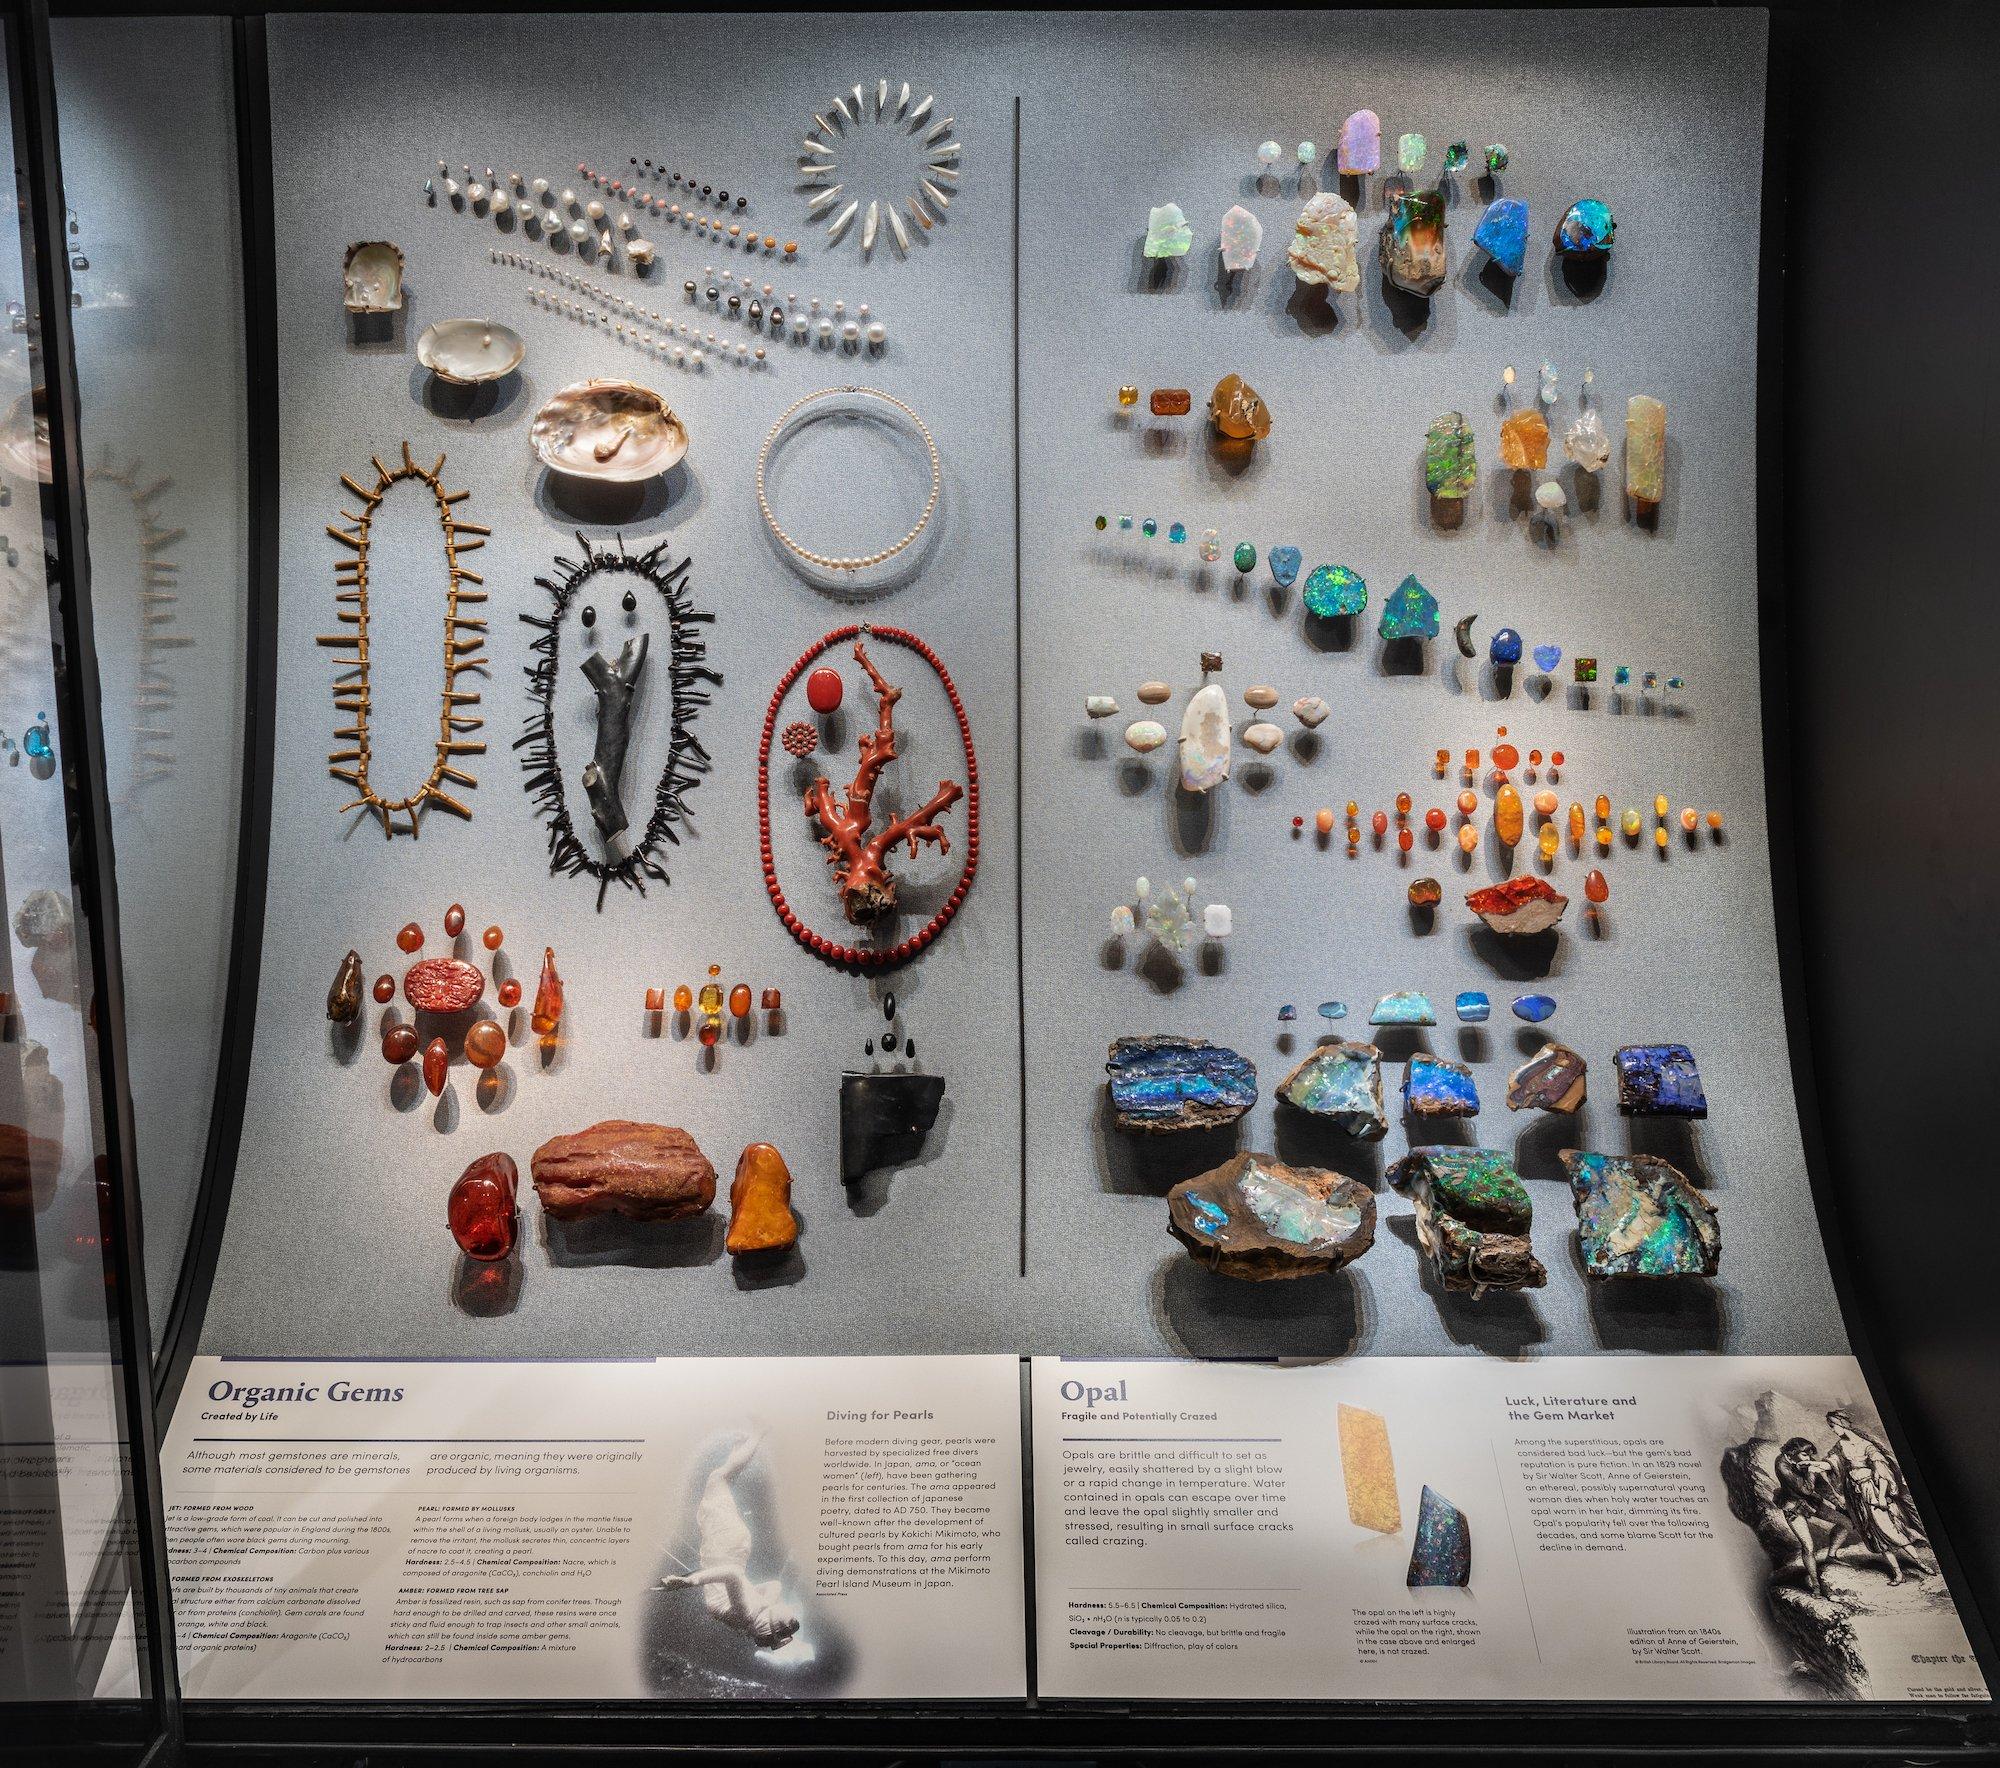 9.-Organic-Gems-and-Opal-Display.jpg